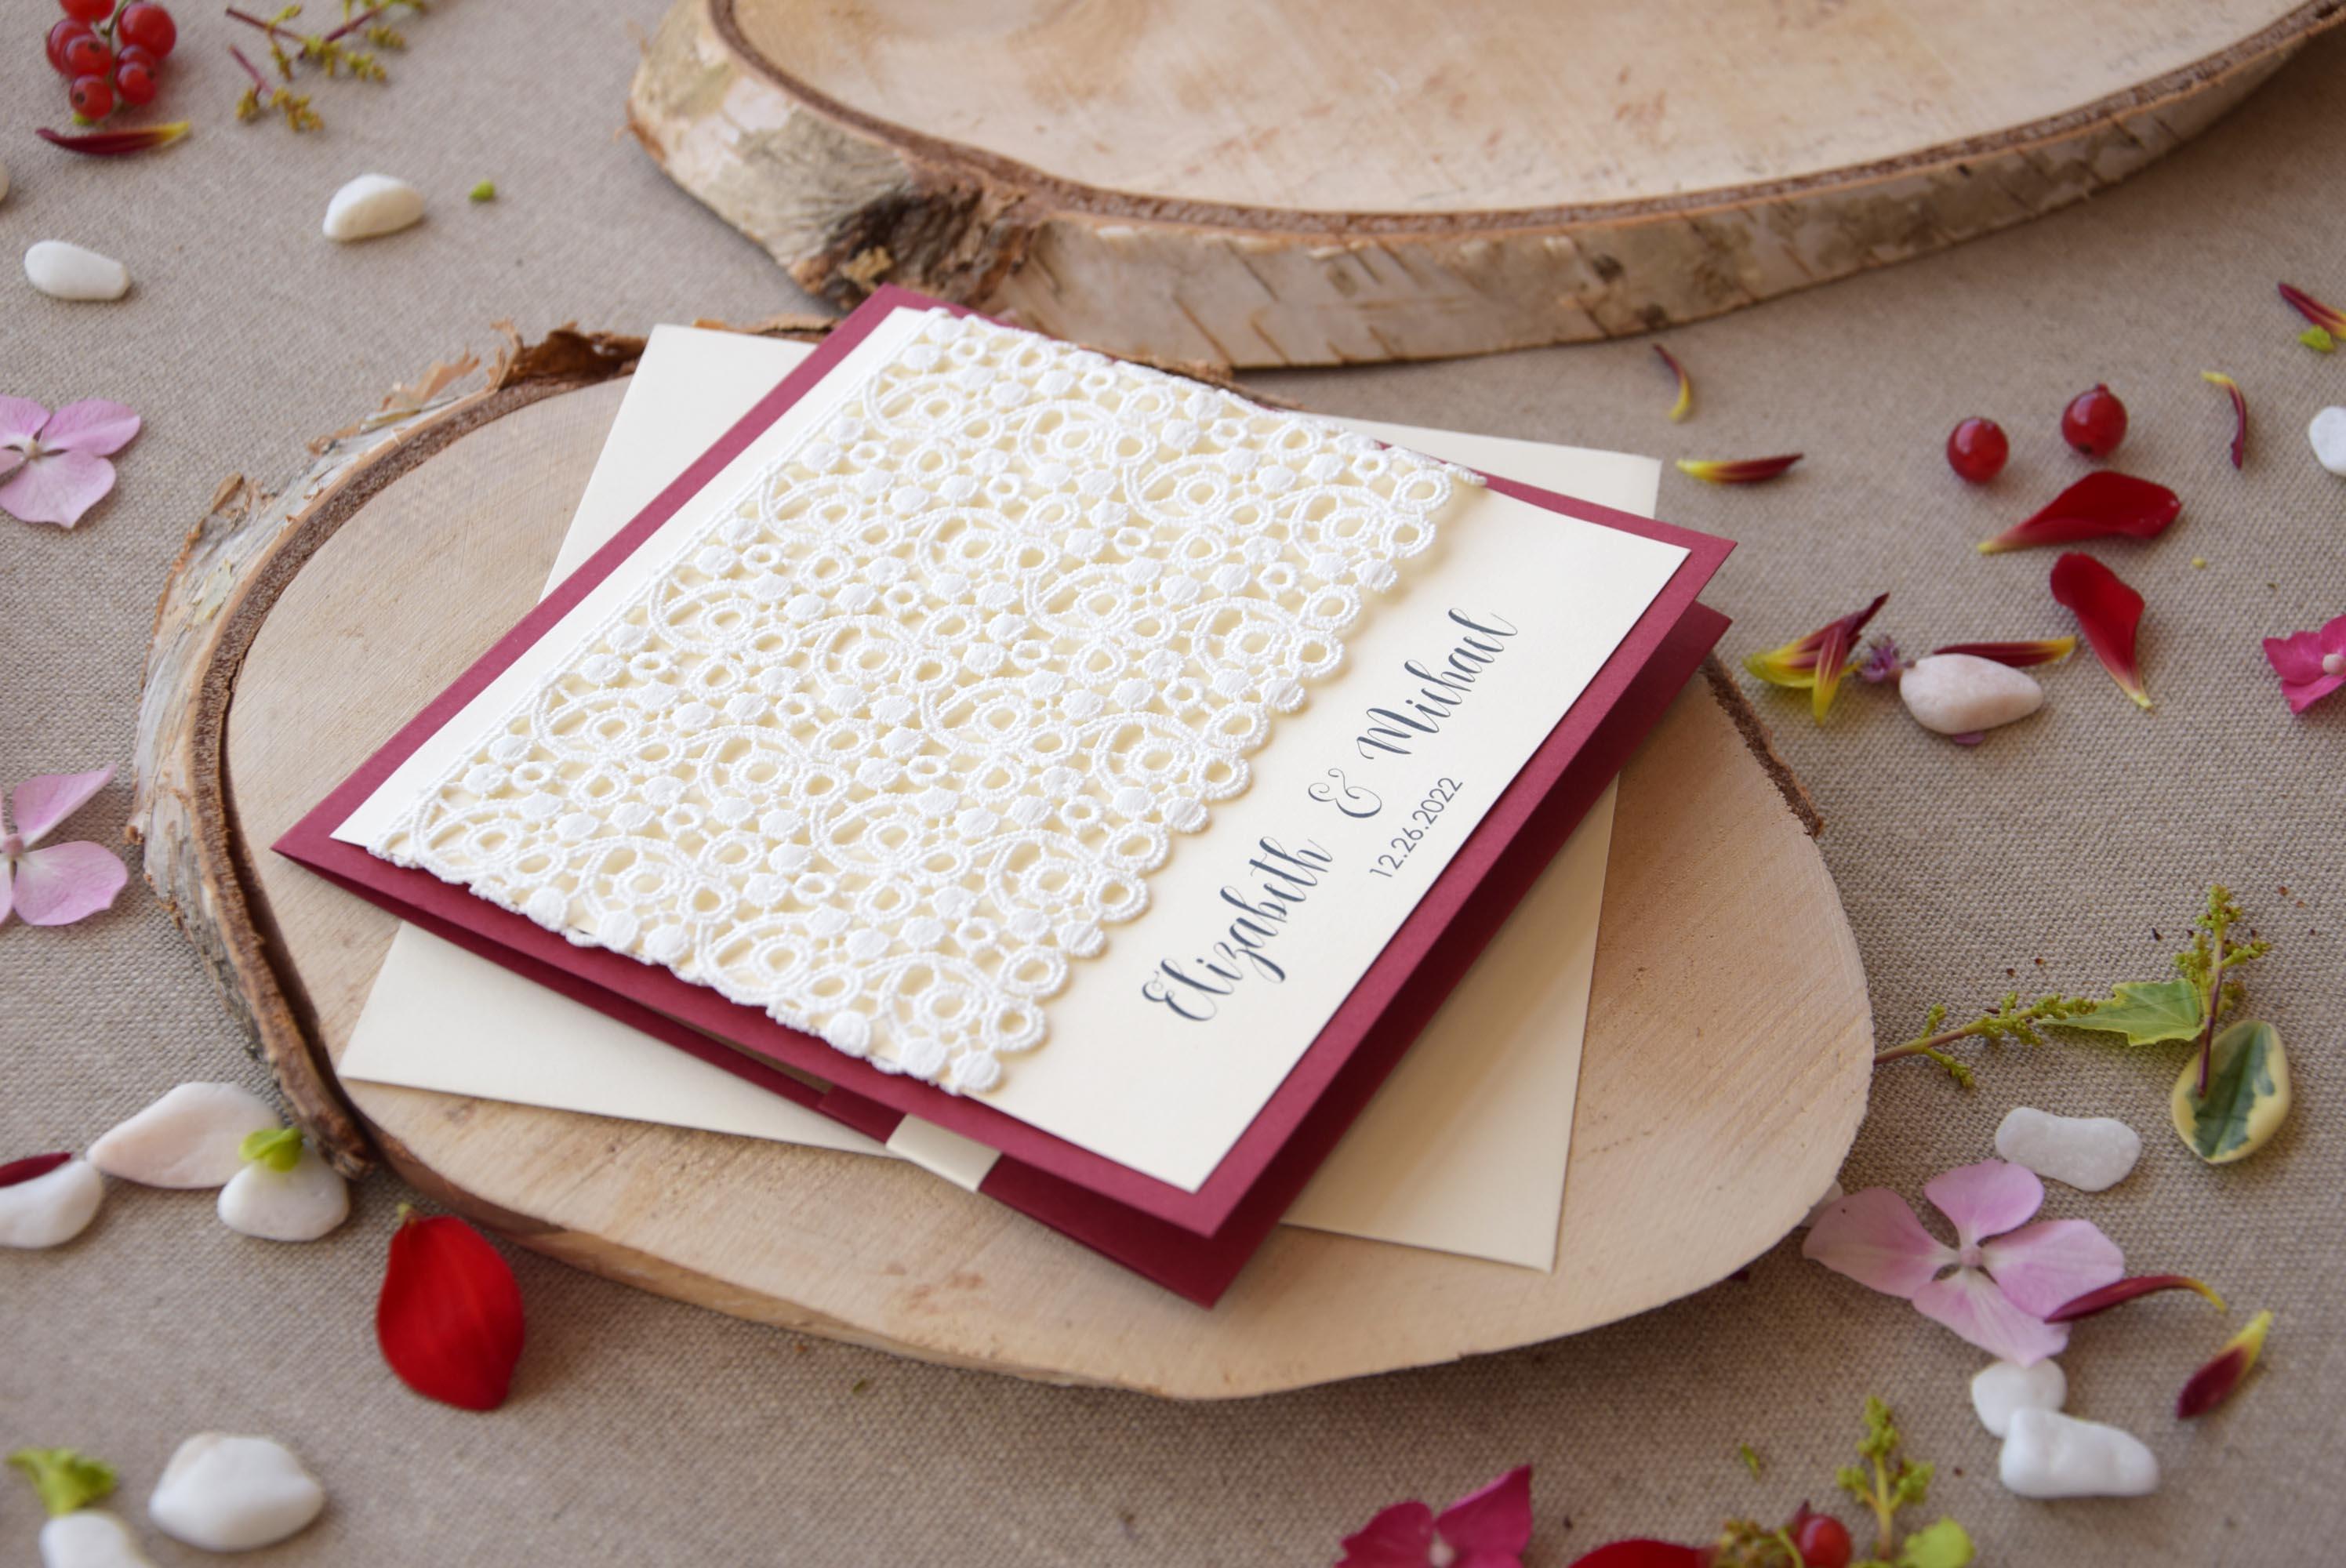 Burgundy Wedding Invitation #rusticinvitations #laceweddinginvitations #rusticwedding #rusticlaceweddinginvitations